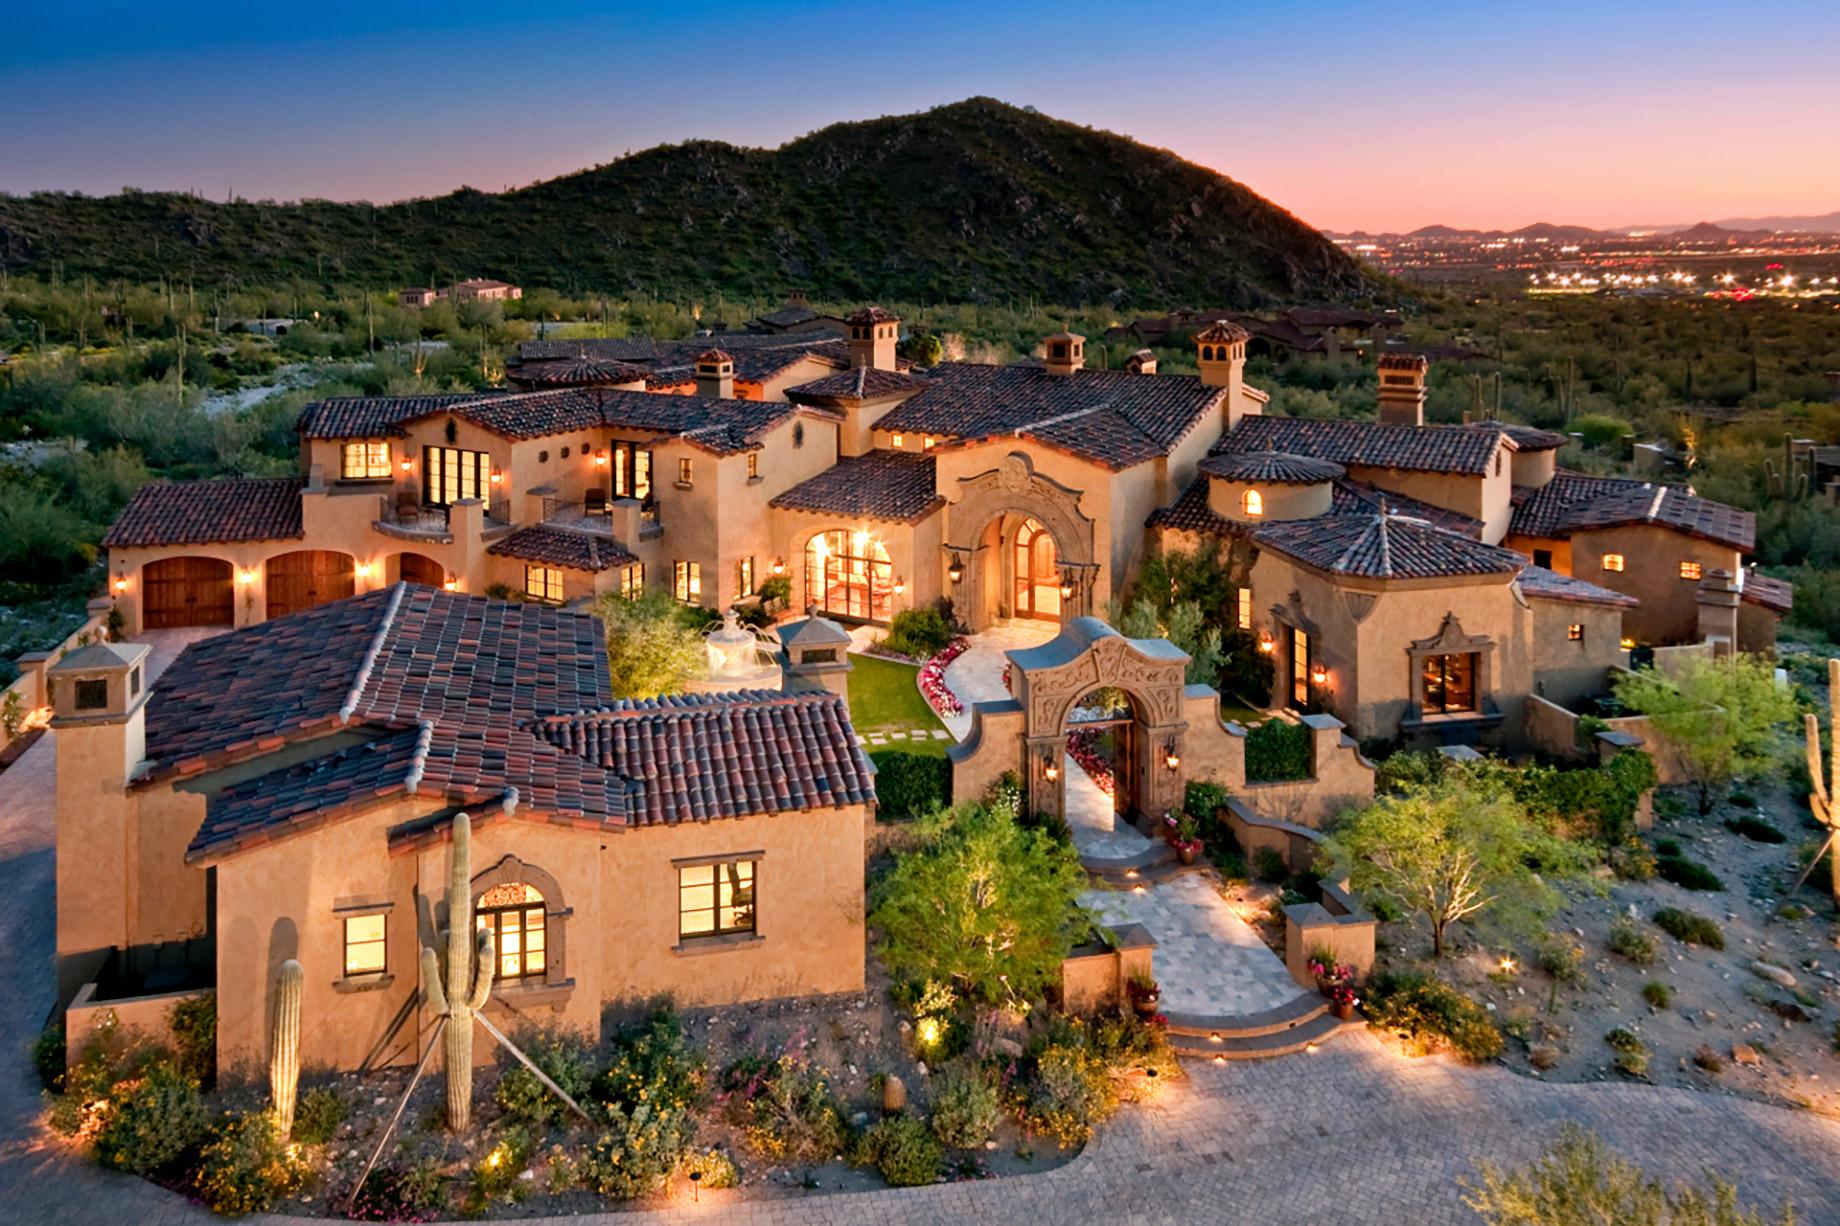 Scottsdale Luxury Real Estate - Arizona, USA